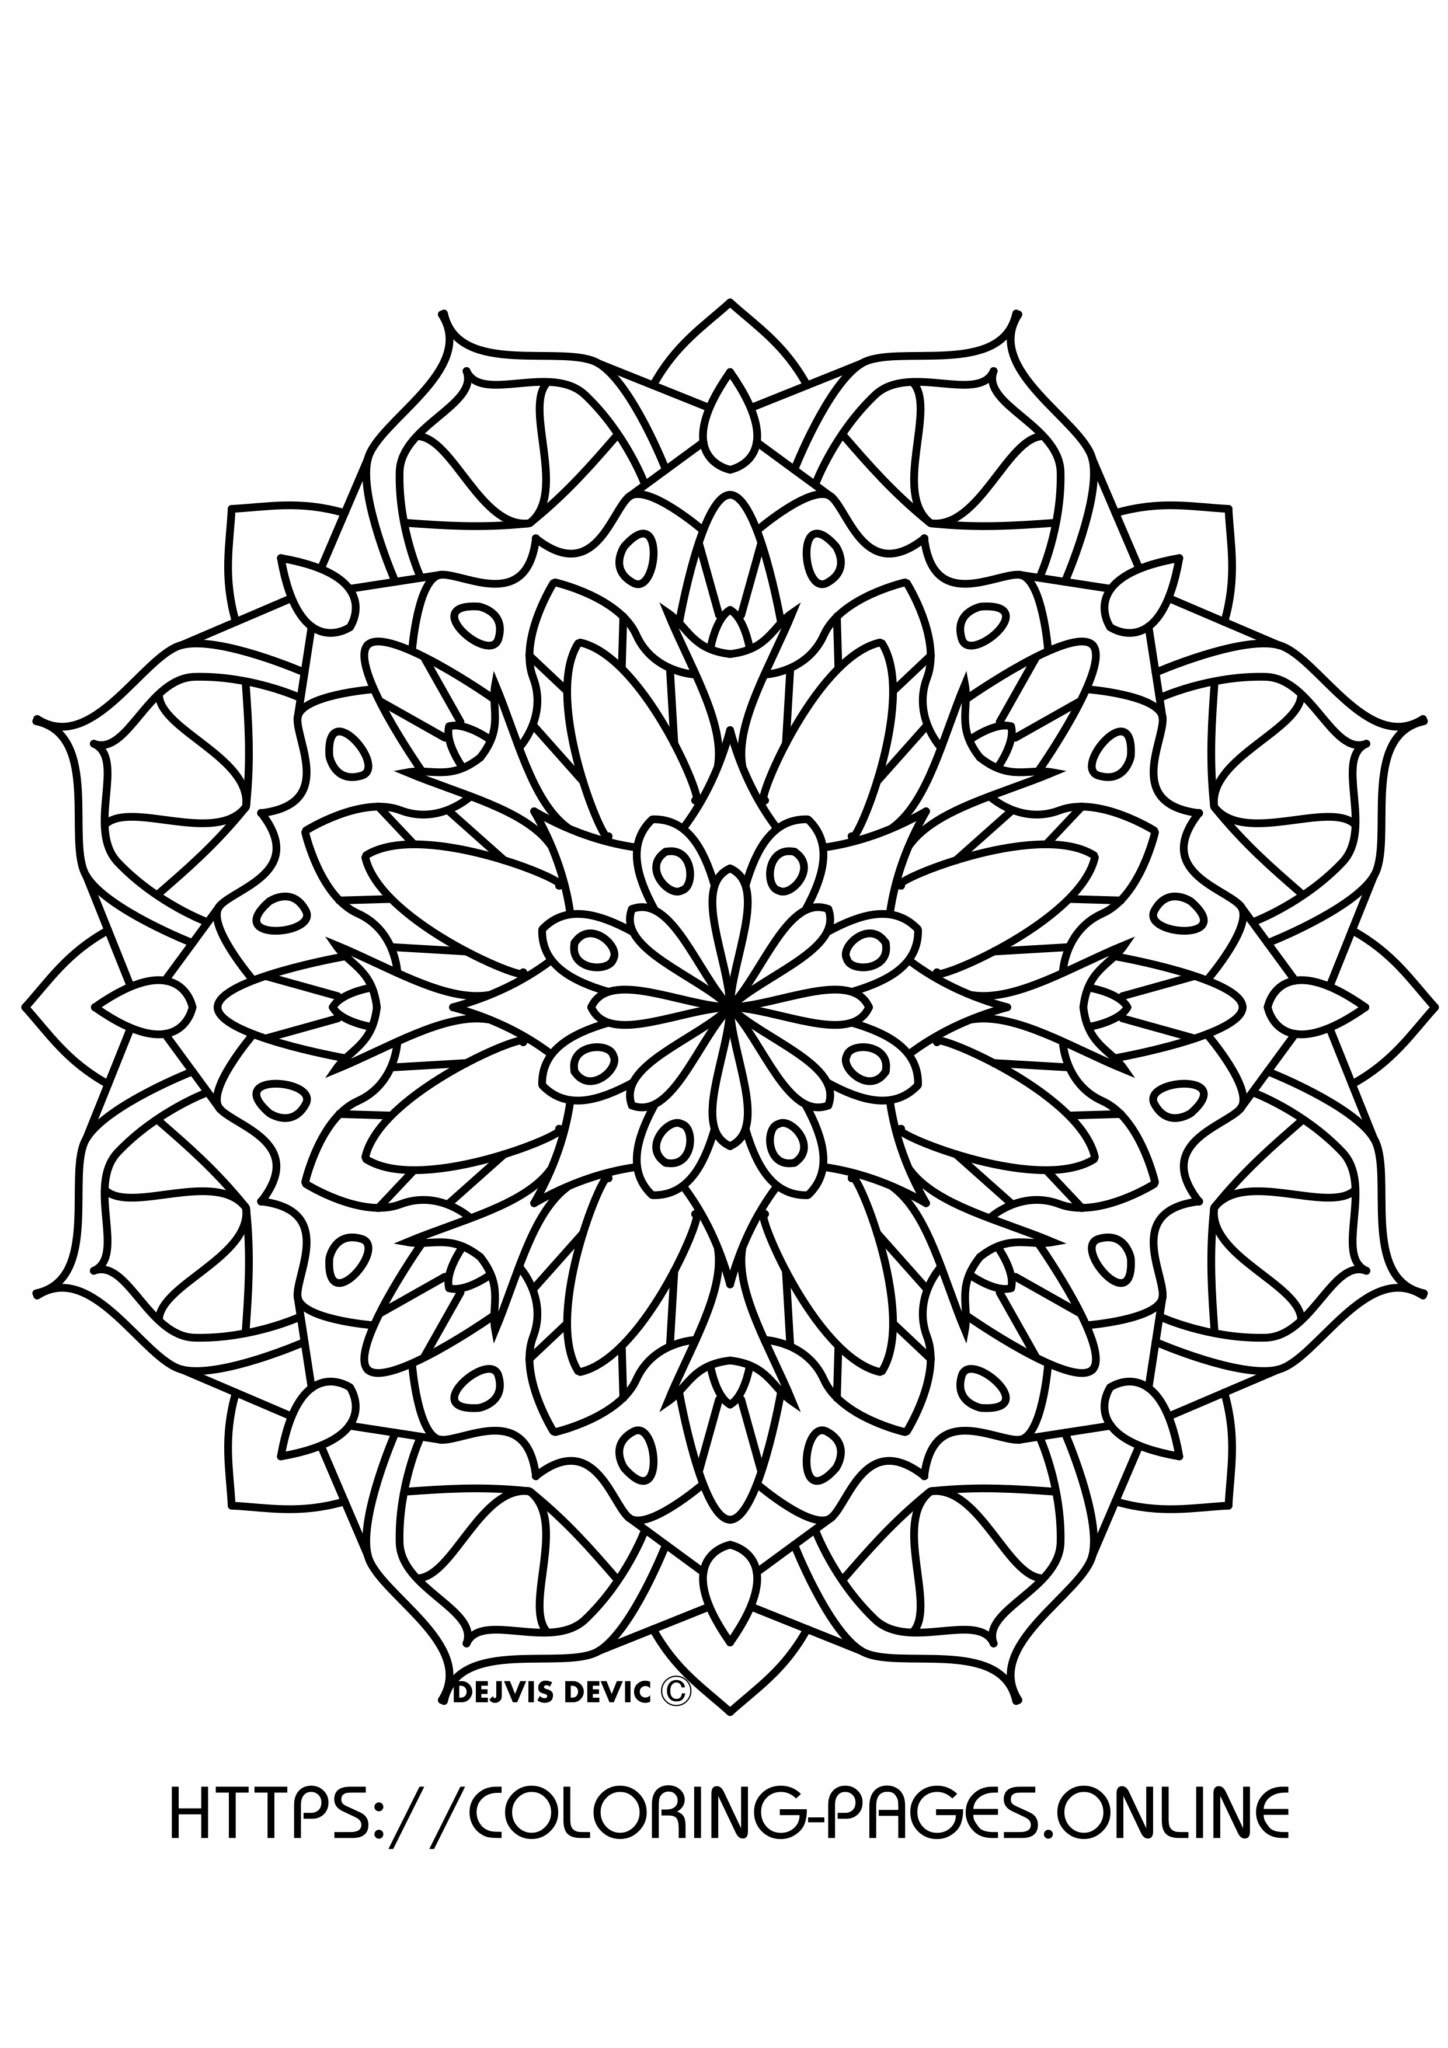 Retro mandala coloring page